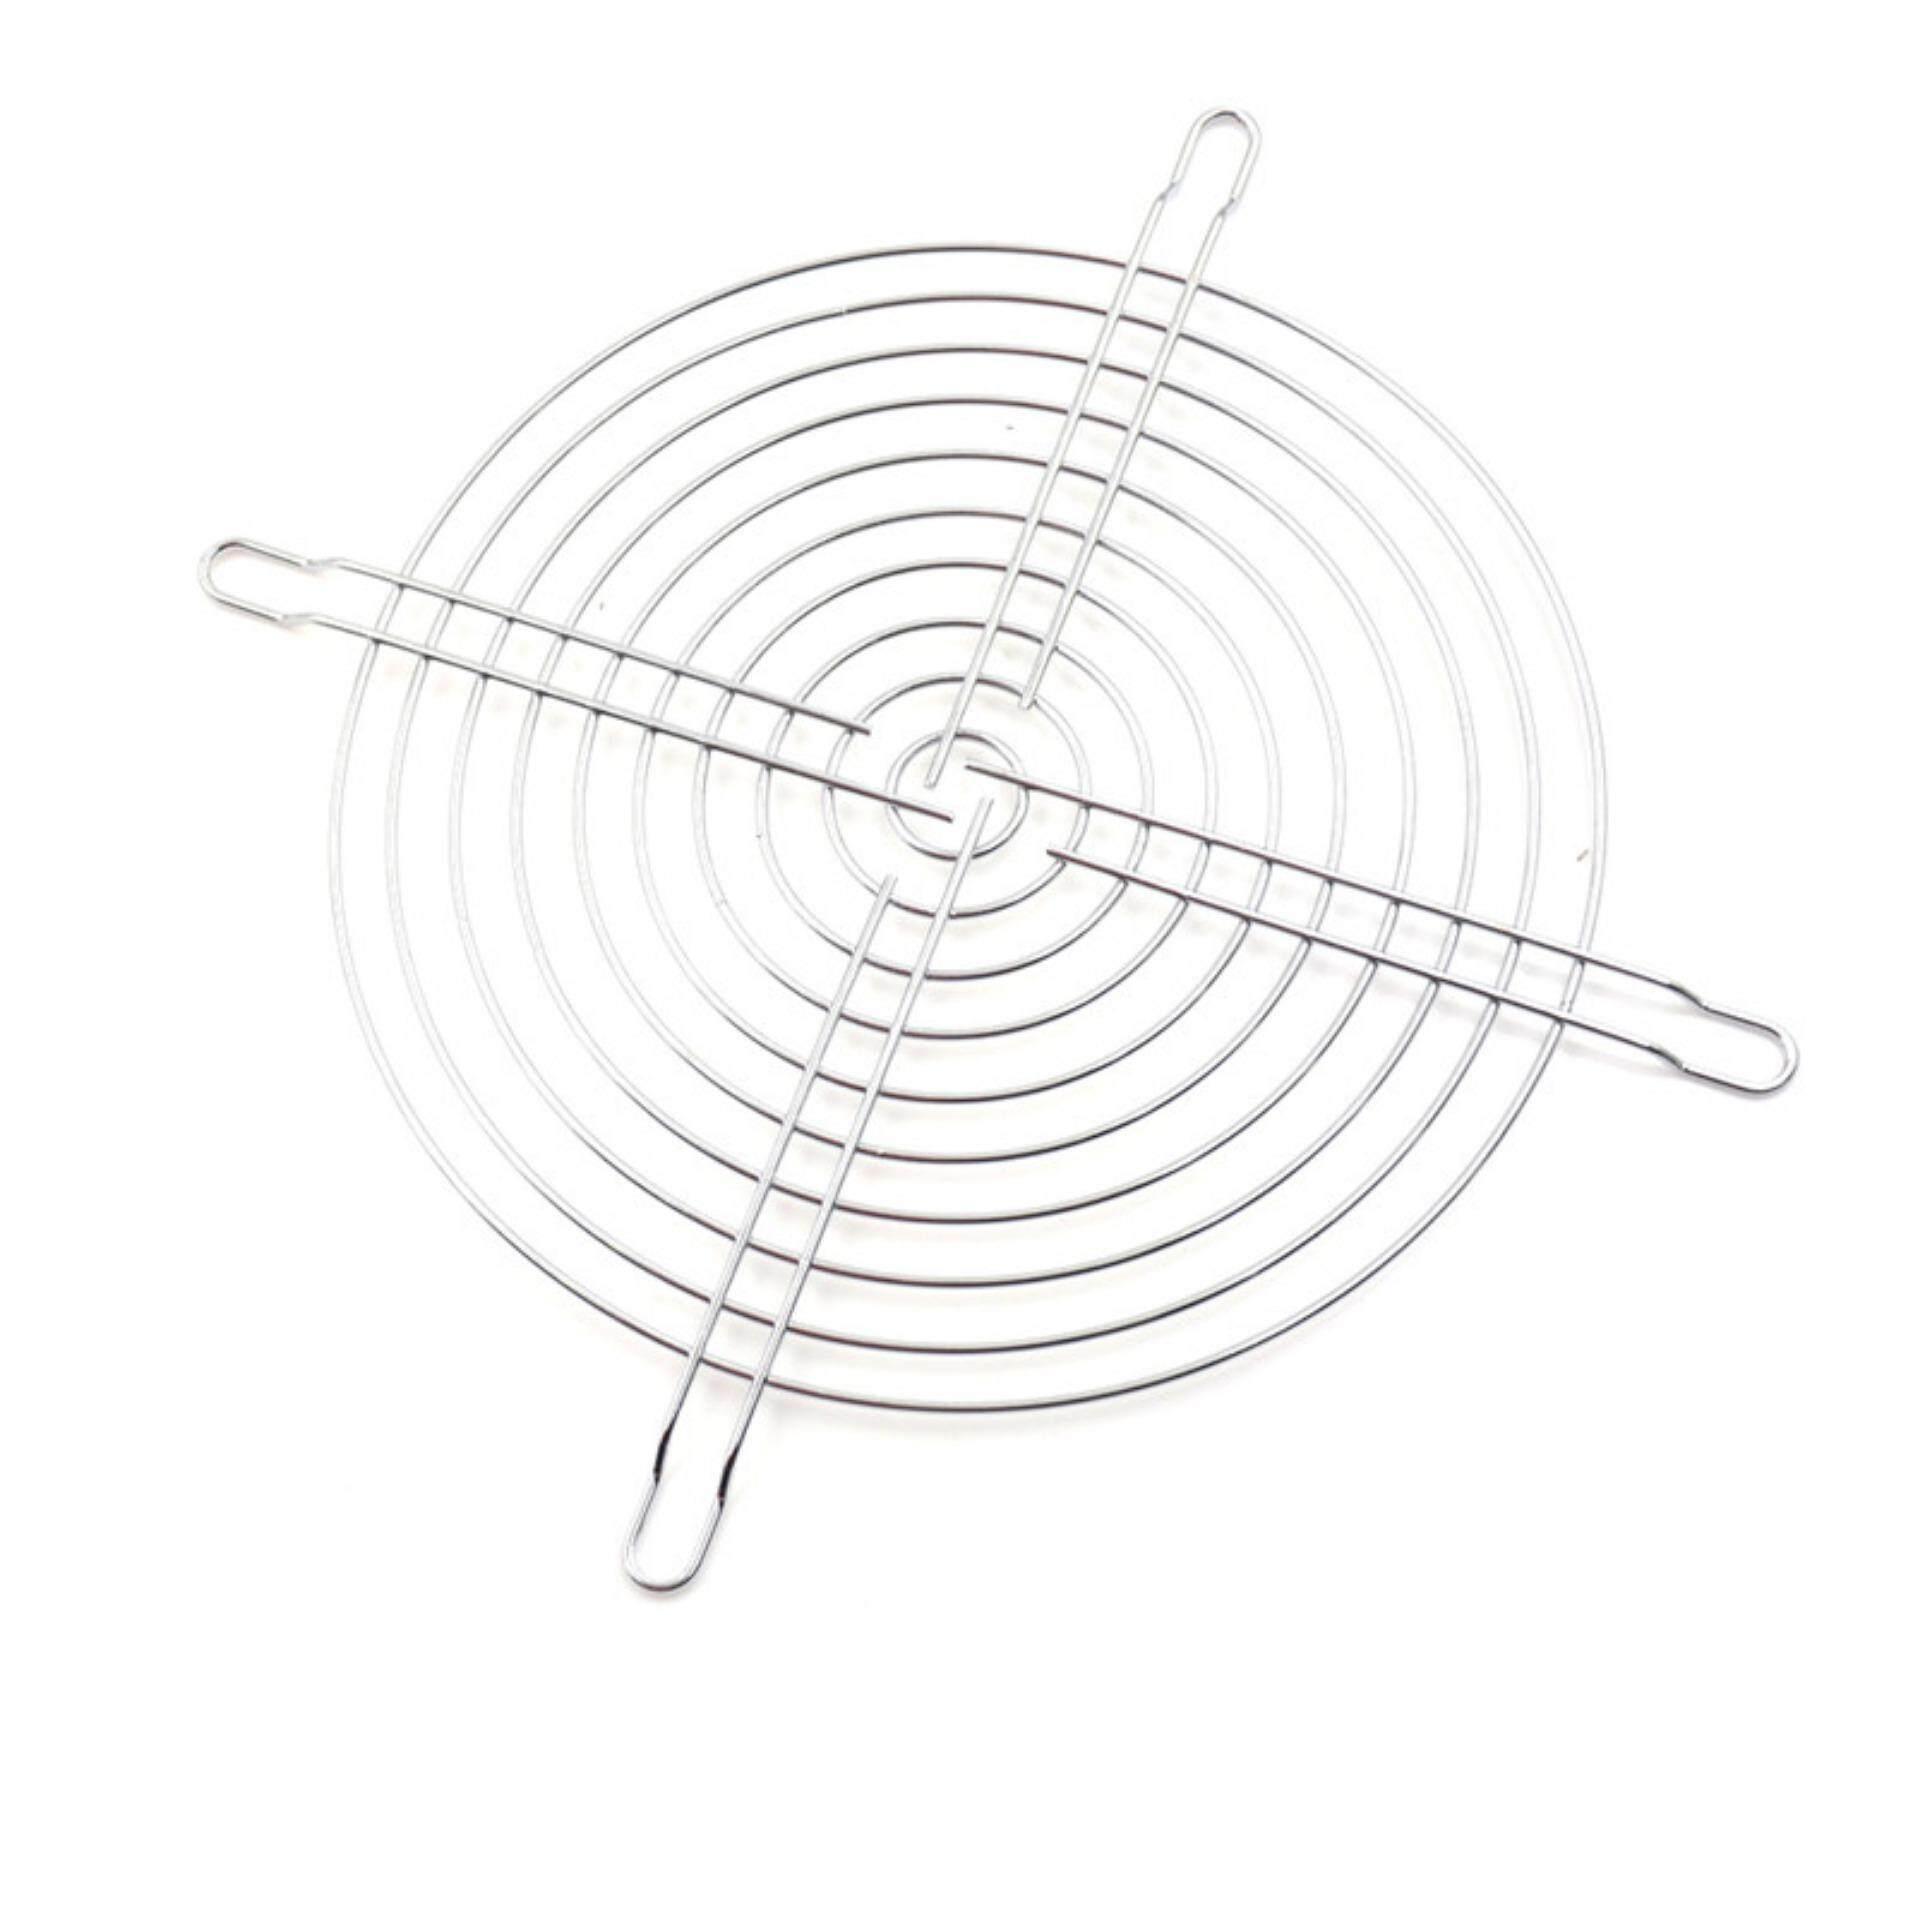 Hình ảnh 18cm Metal Wire Finger Guard 180mm CPU Fan DC Fan Grill/Guard Protector One Size - intl